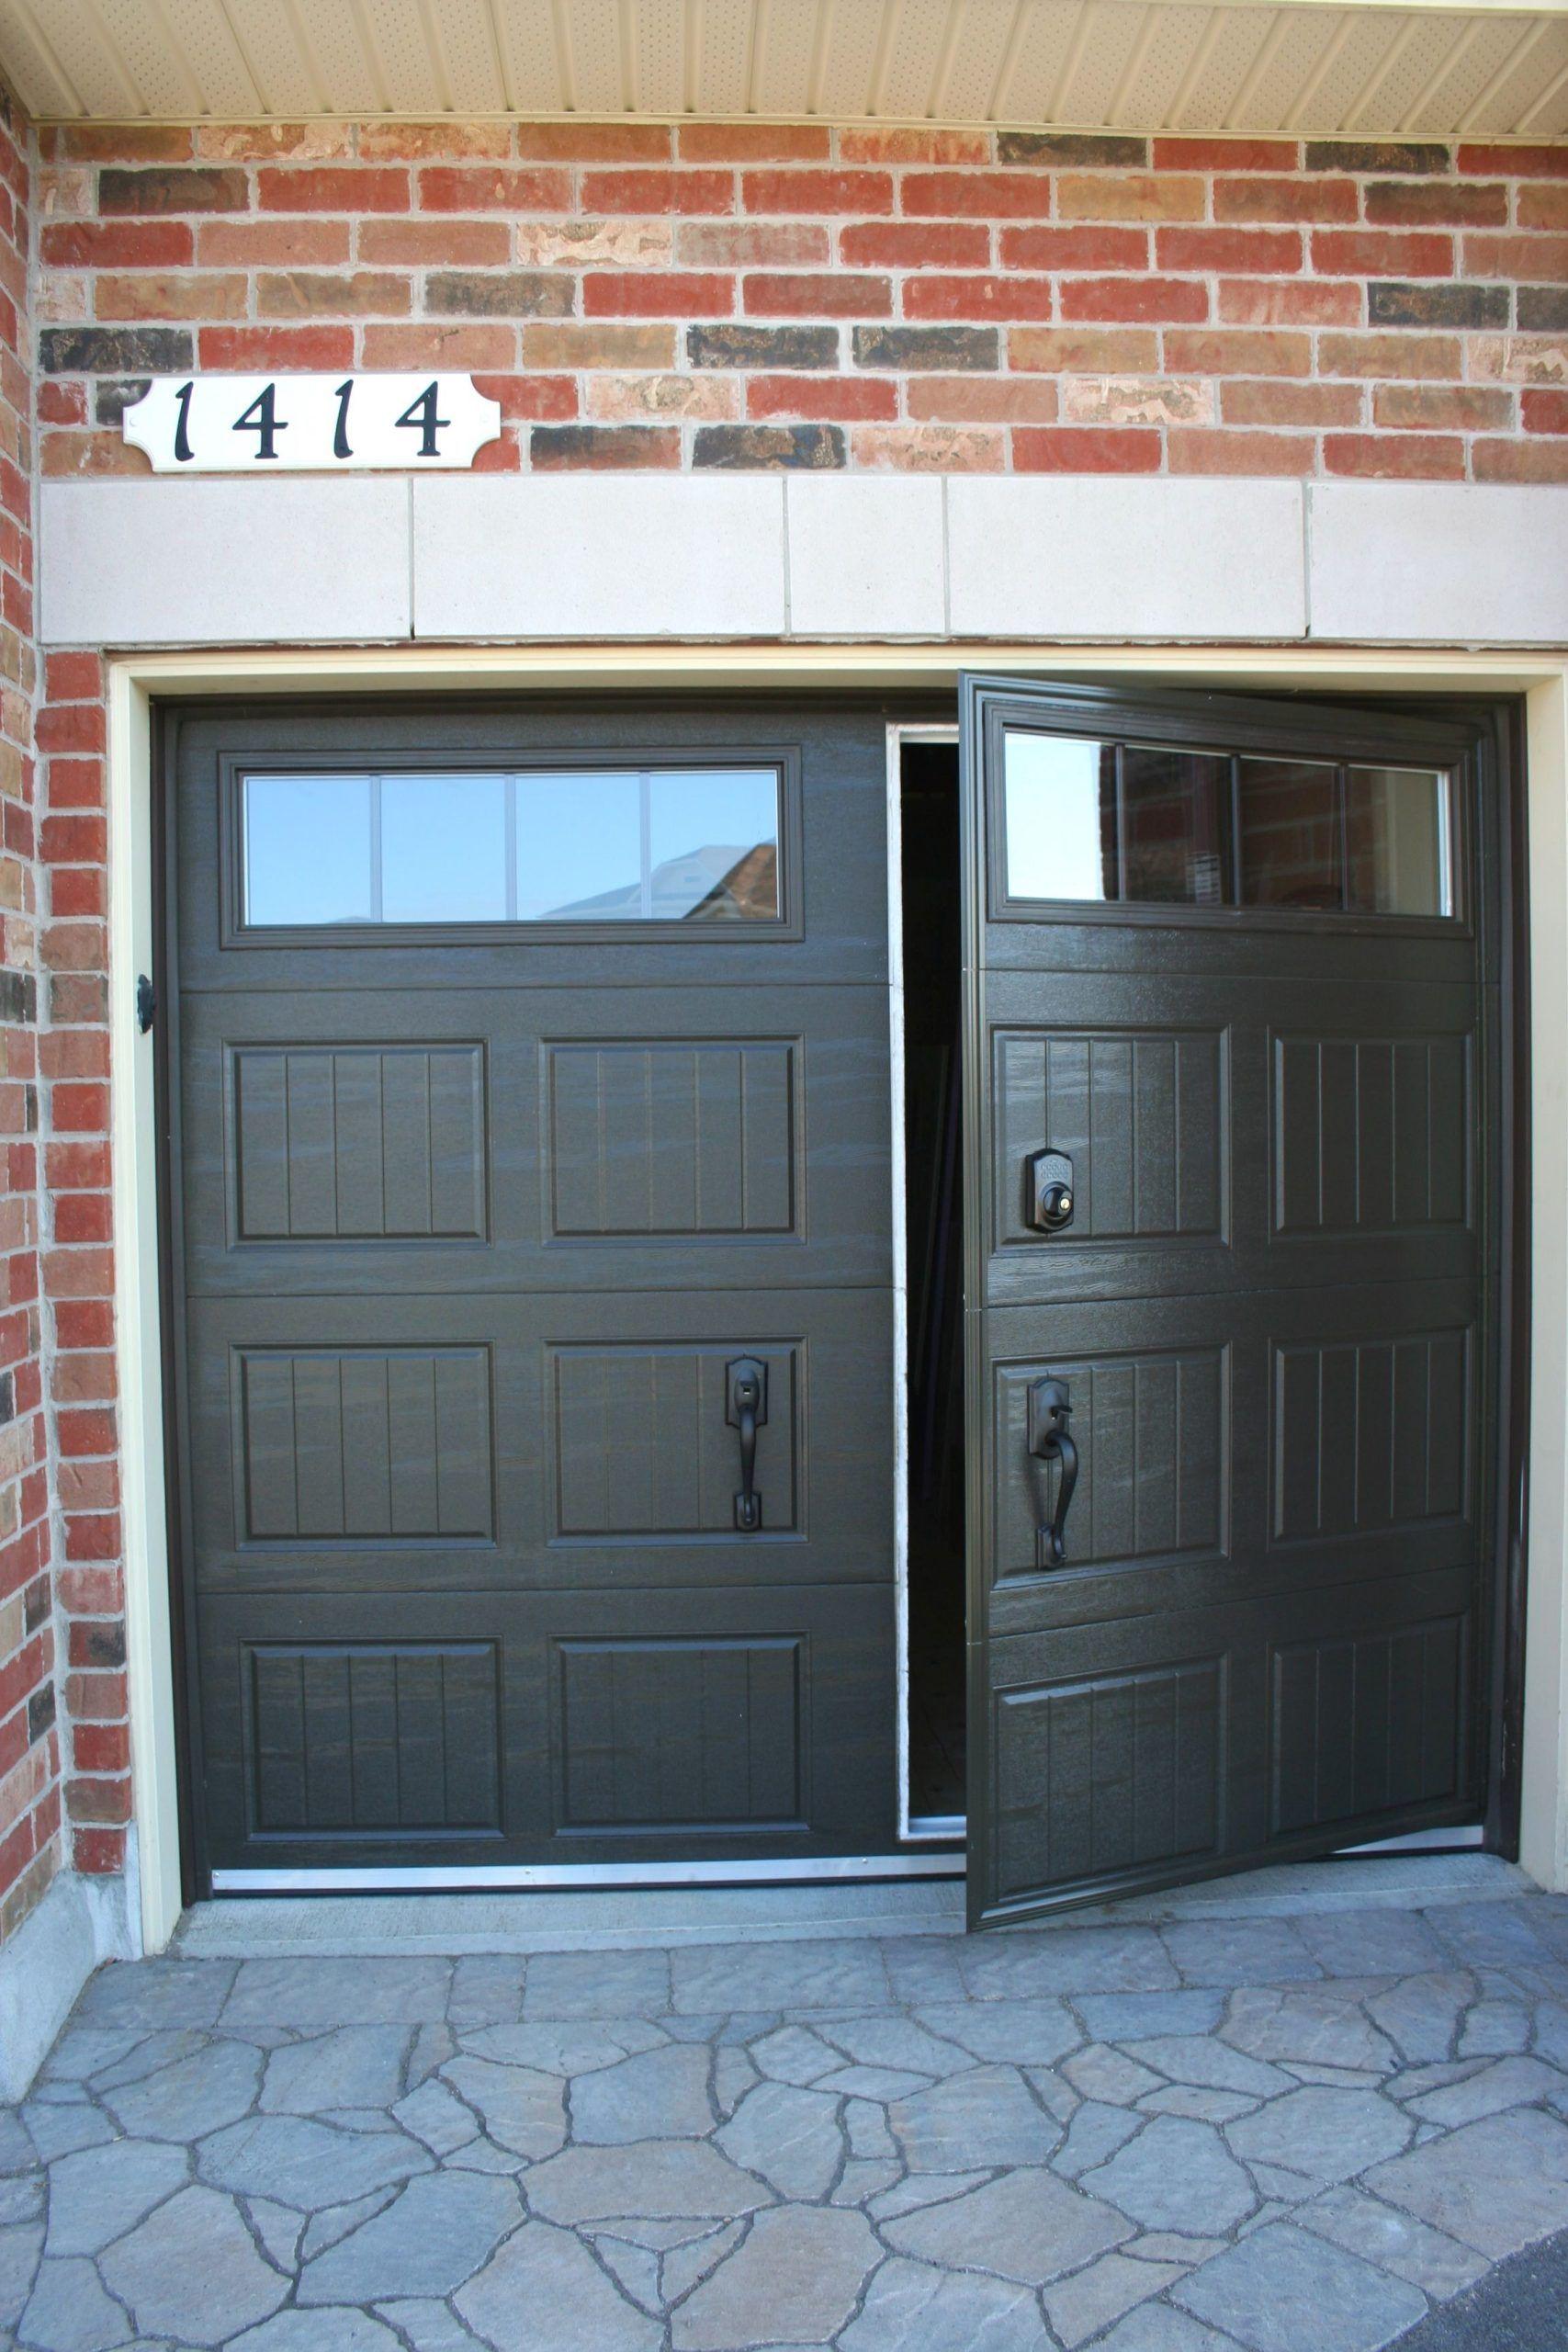 Convert Garage To Office Cost Convert Cost Garage Office Convert Cost Costconvert Garage Office In 2020 Garage Doors Garage Door Design Garage Door Installation